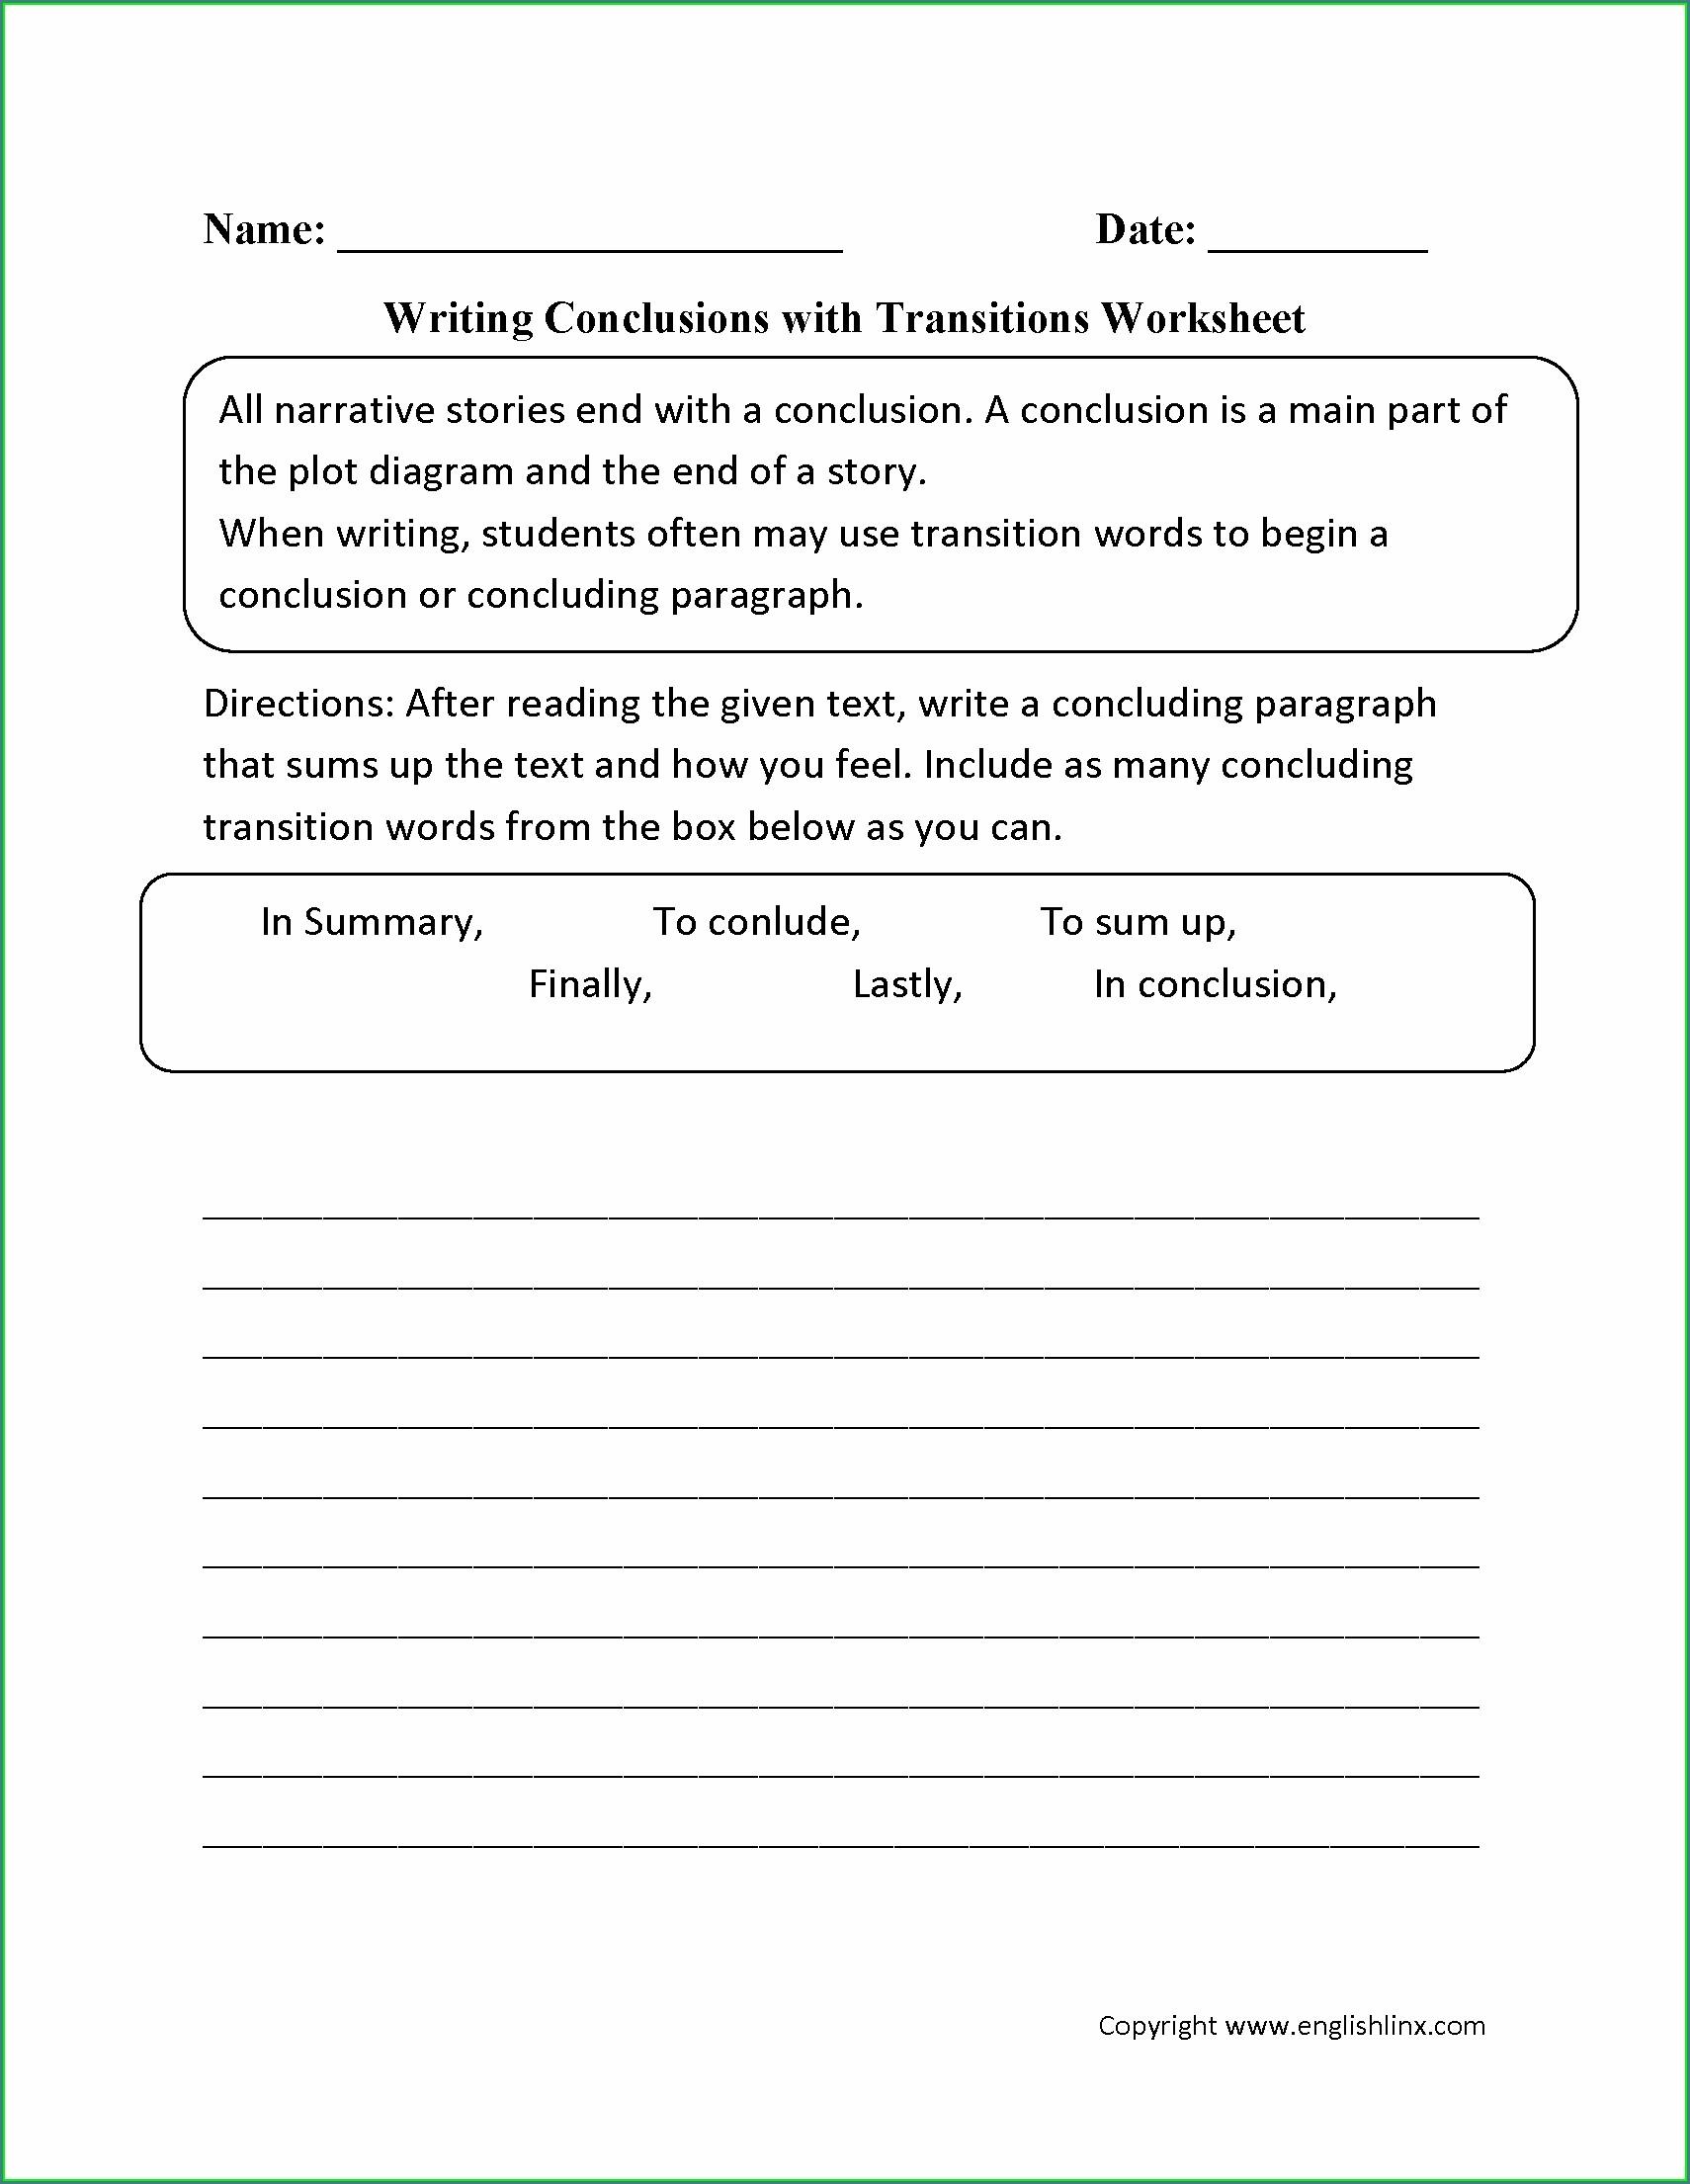 Using Transition Words Writing Worksheet